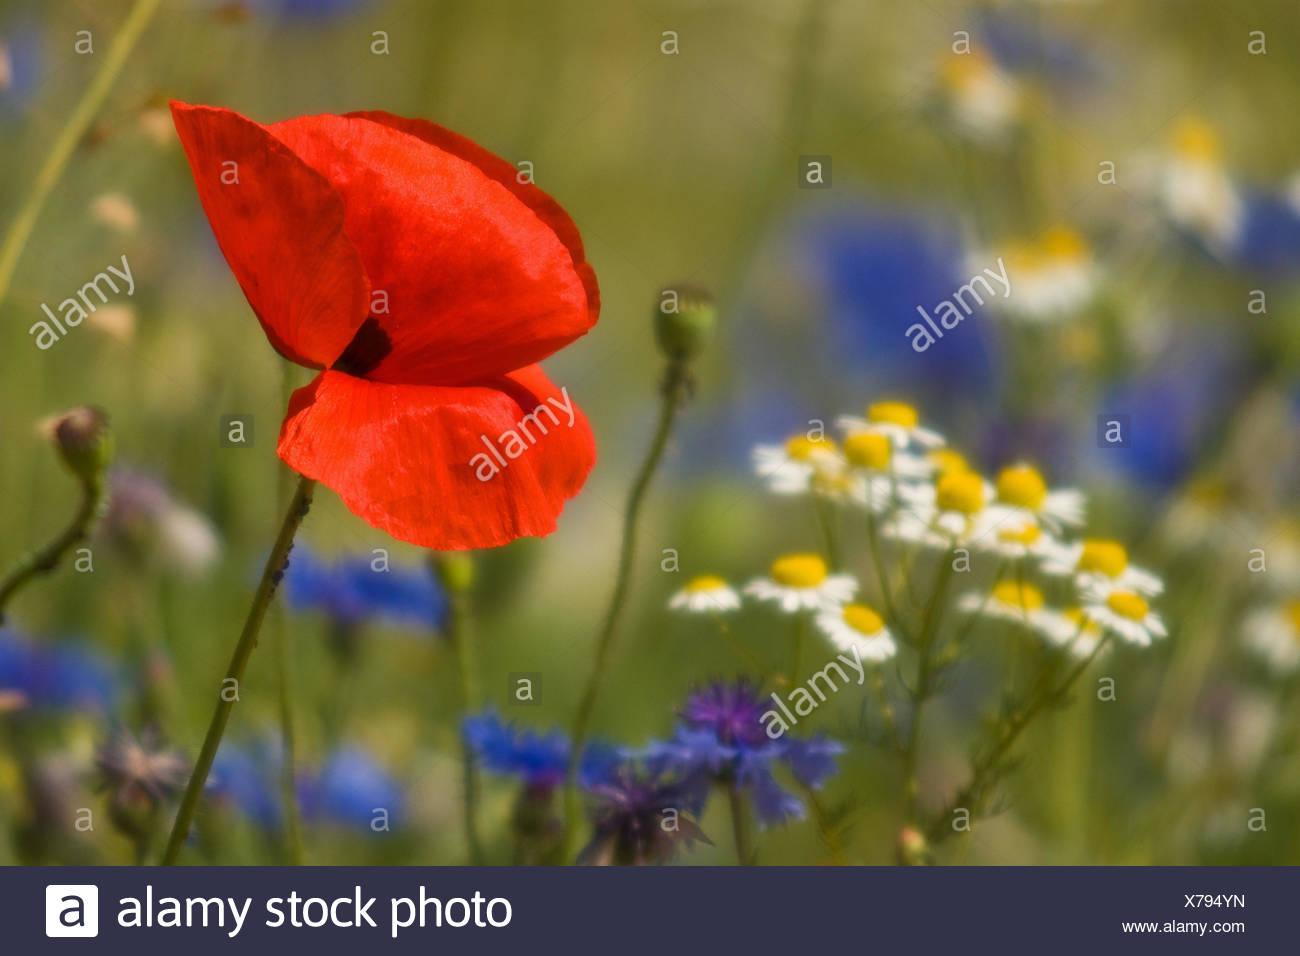 Flower meadow, clap poppy seed, cornflowers, camomile, detail, Stock Photo